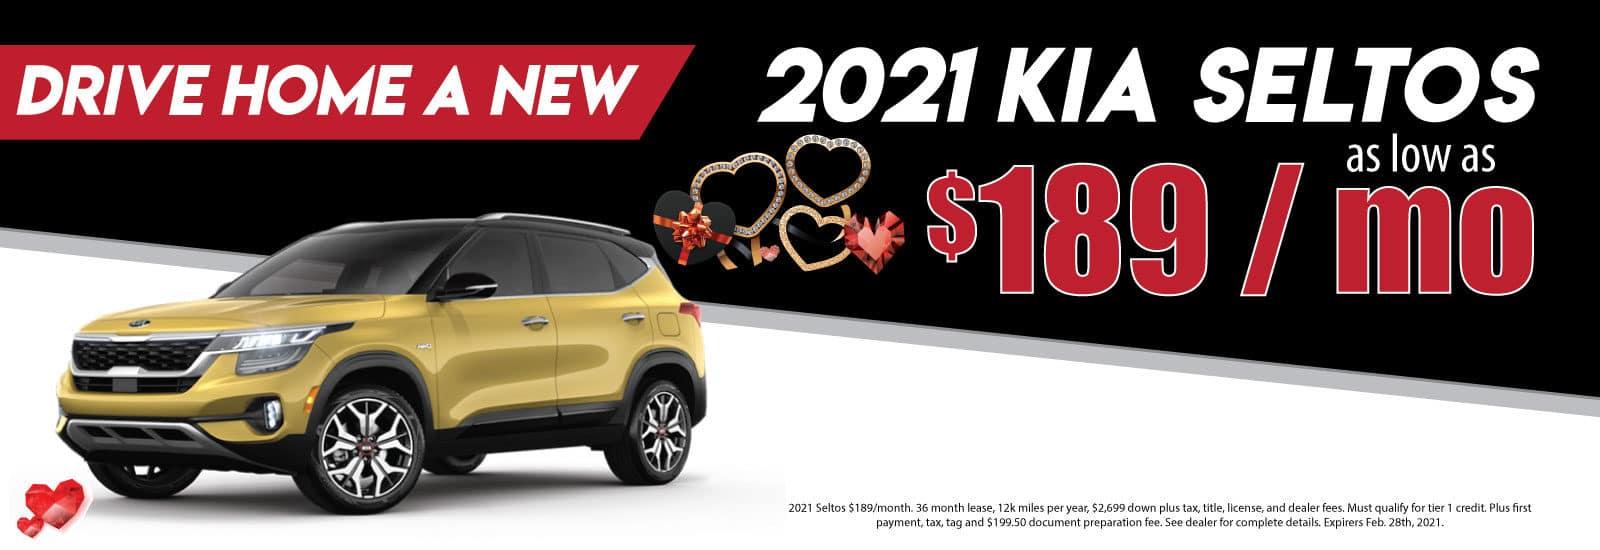 2021-Kia-Seltos-Website-Slider-Banner-1600x550